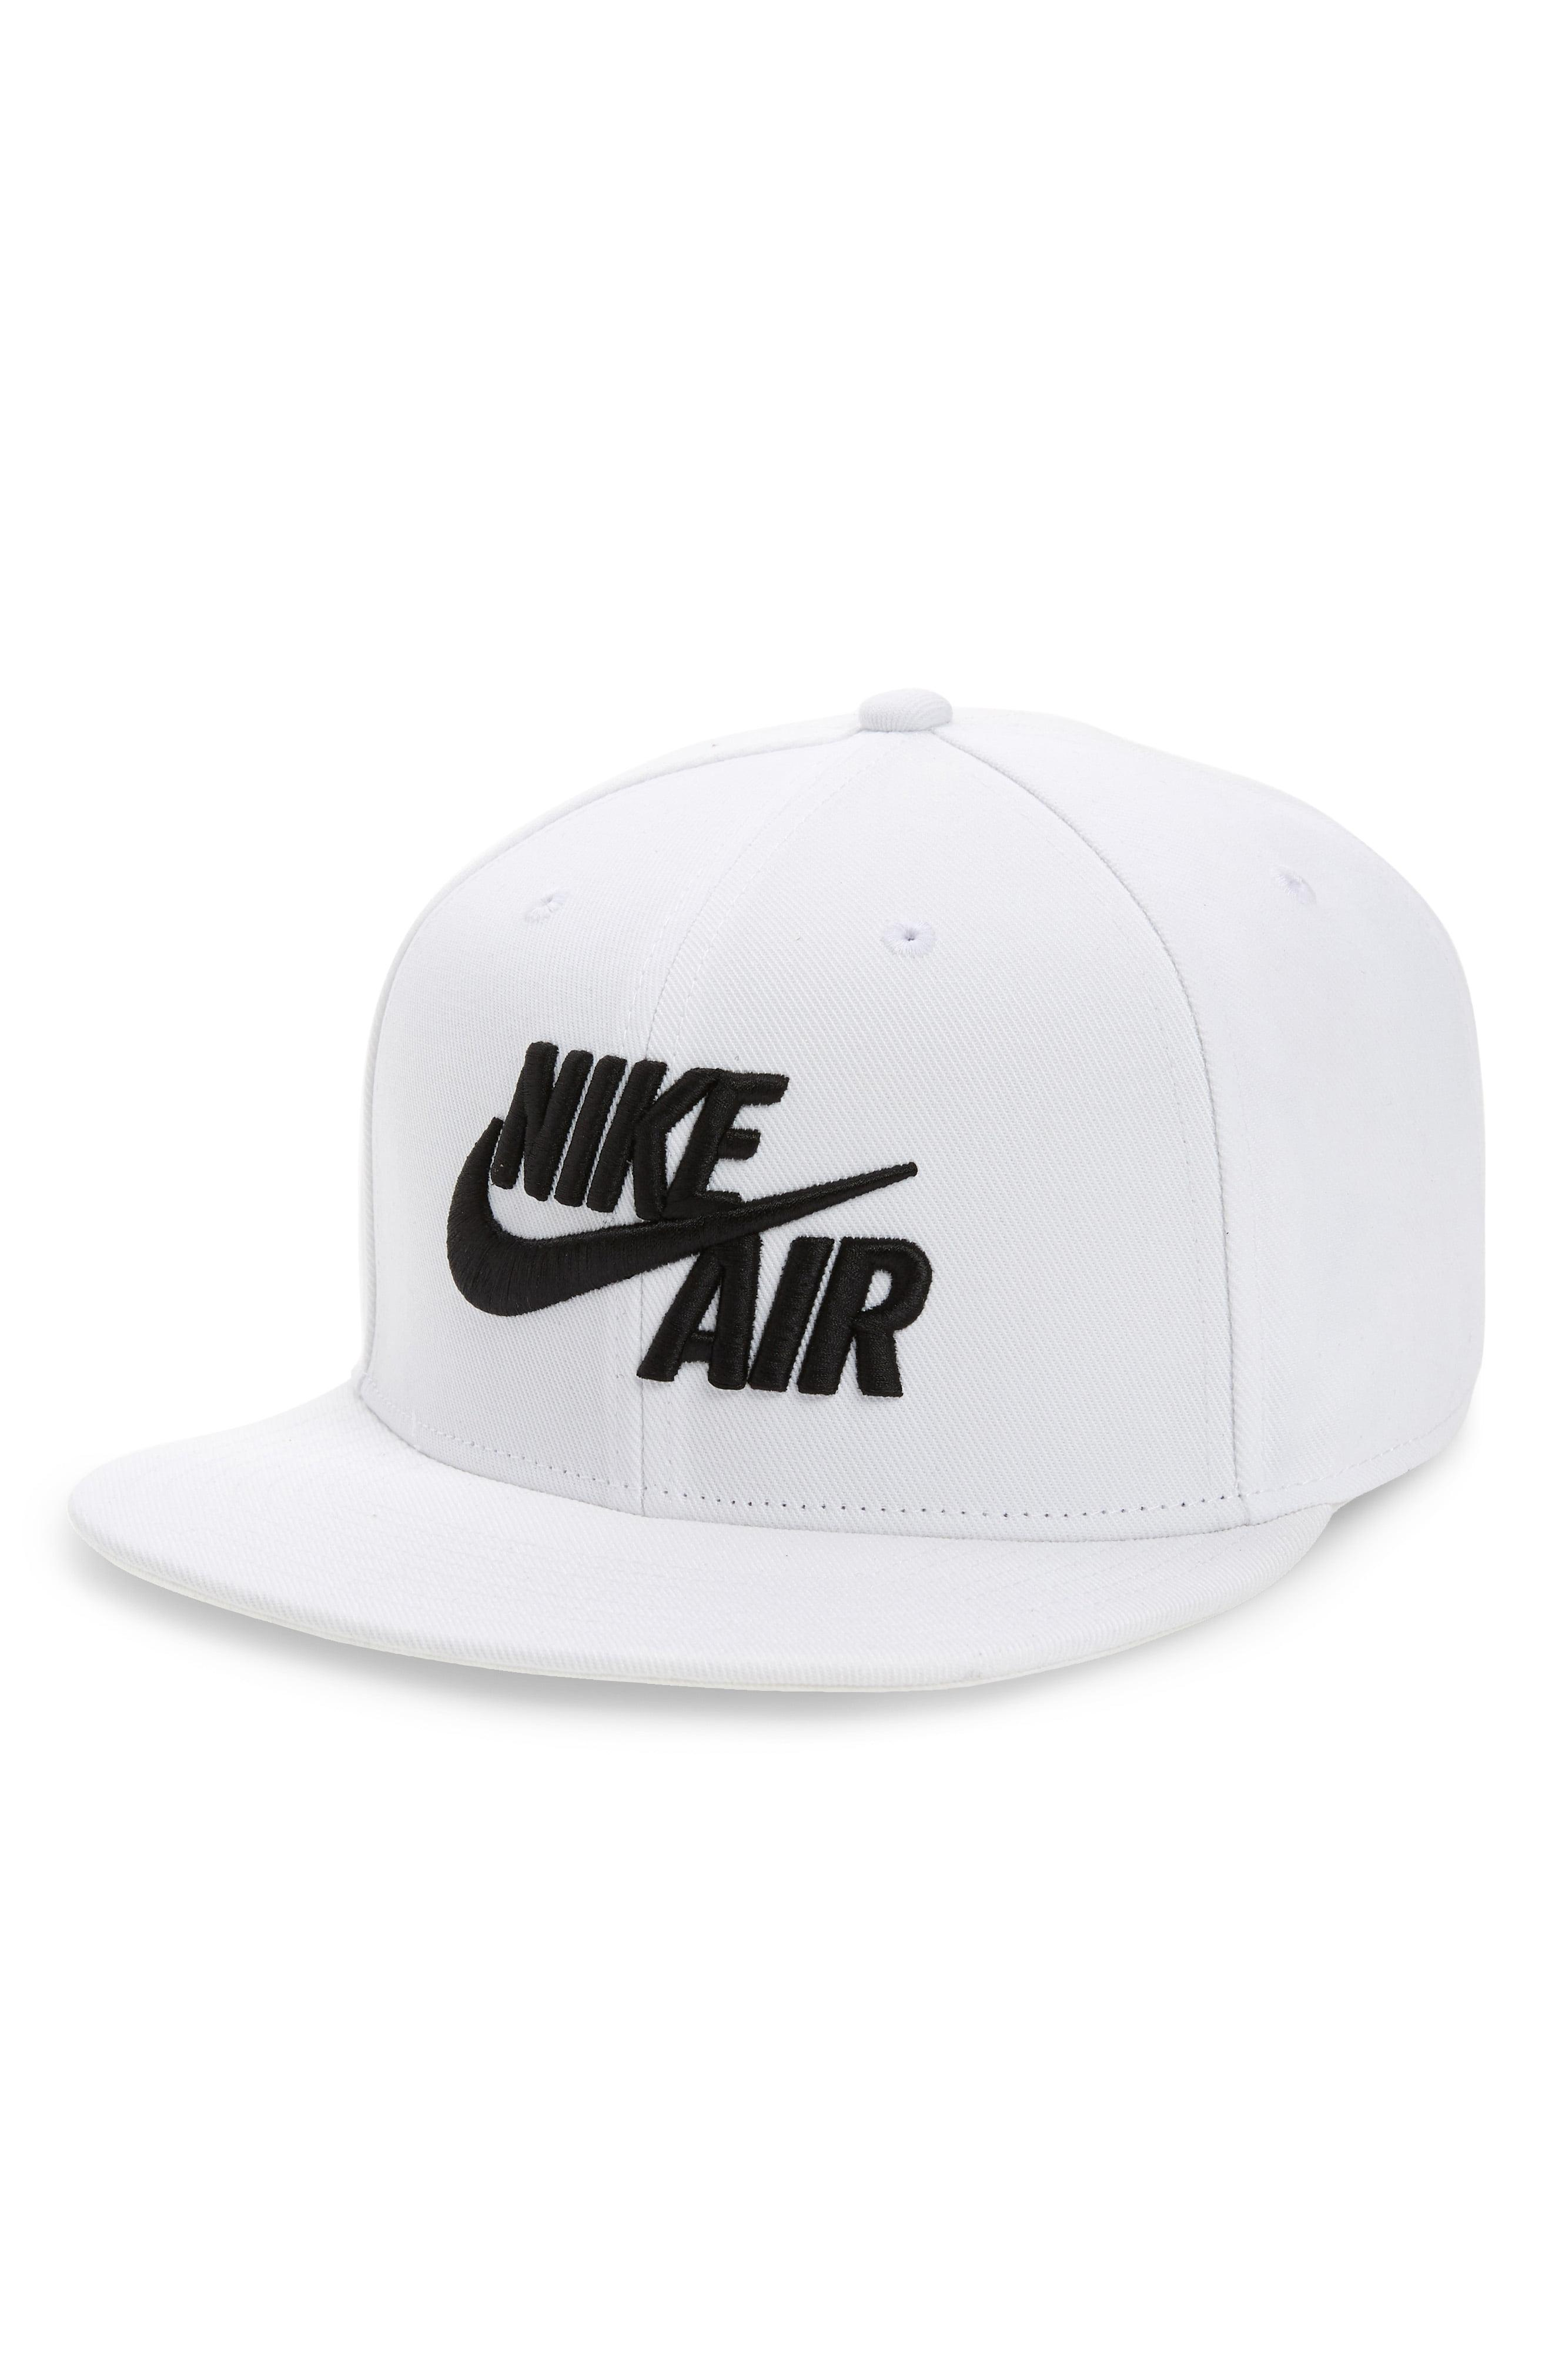 18d34c2edae9d7 Lyst - Nike Pro Cap Air Classic Snapback Baseball Cap in White for ...